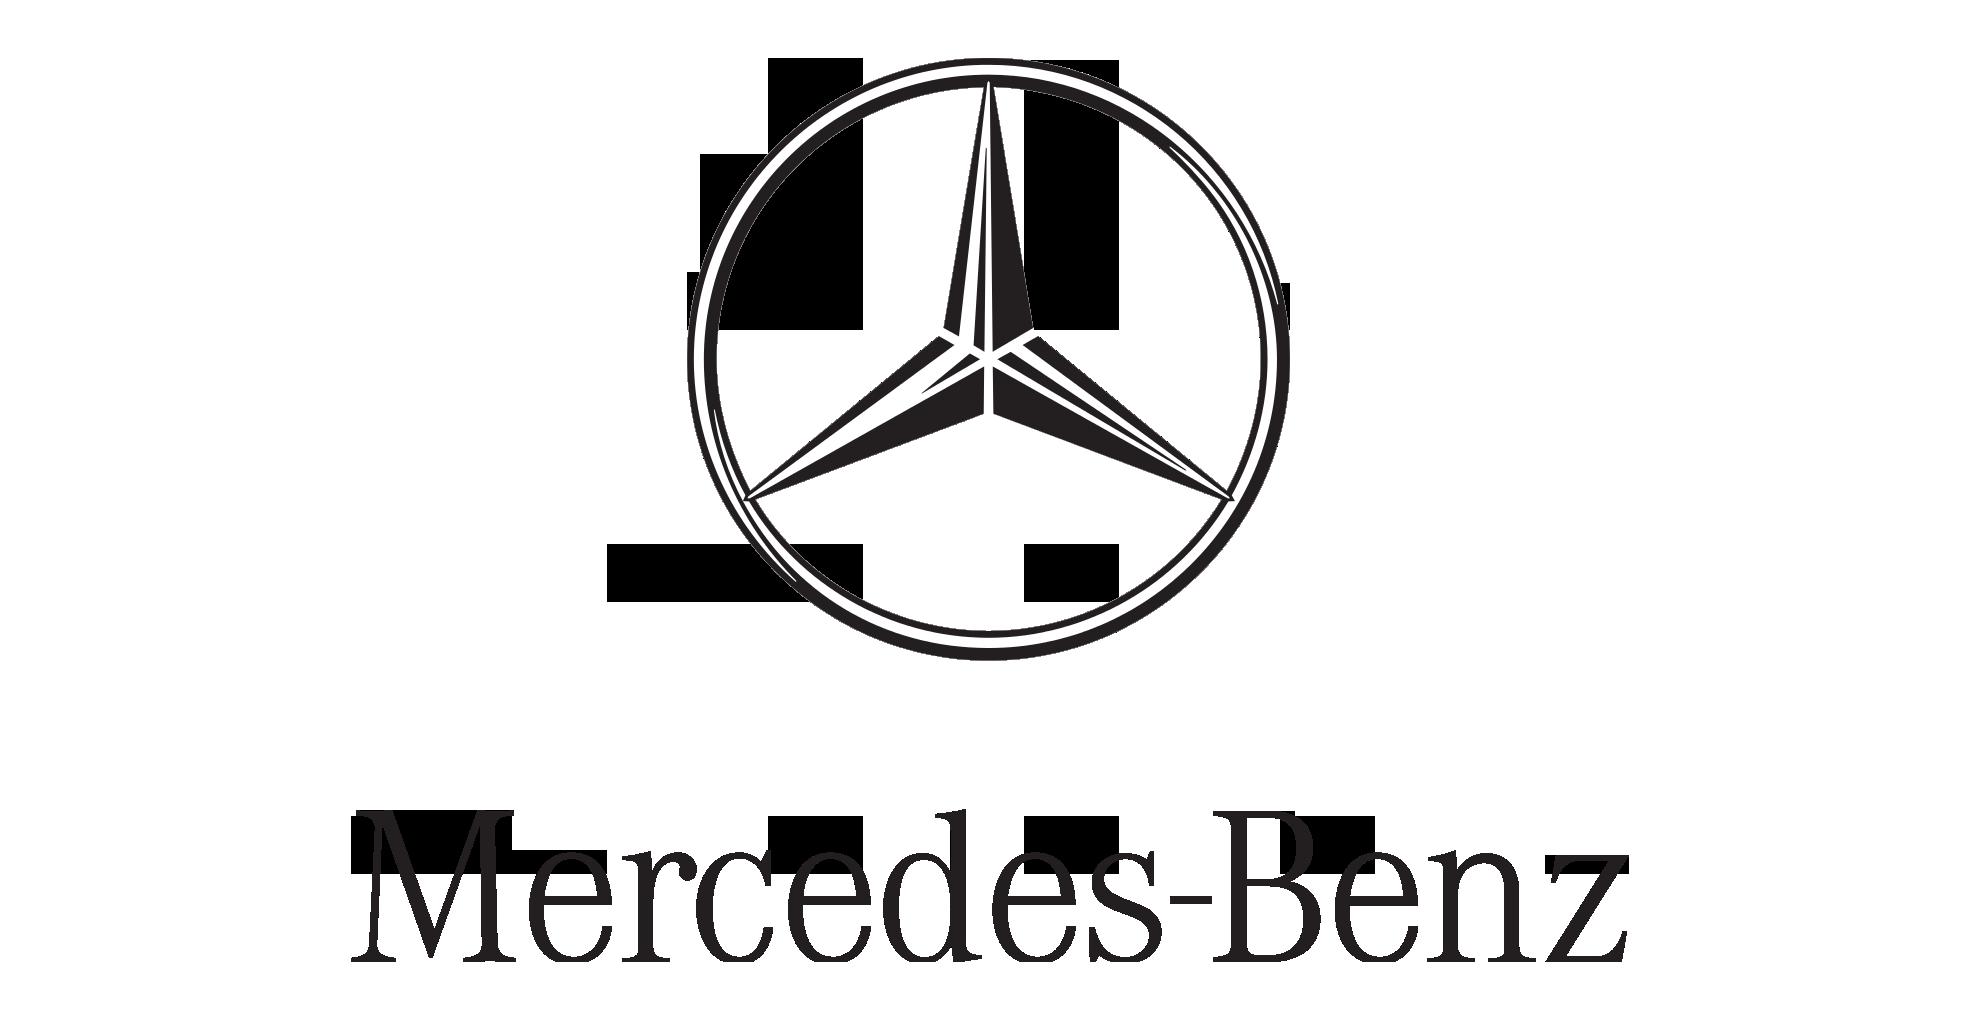 MercedesBenzlogo20081920x1080.png (1980×1020)